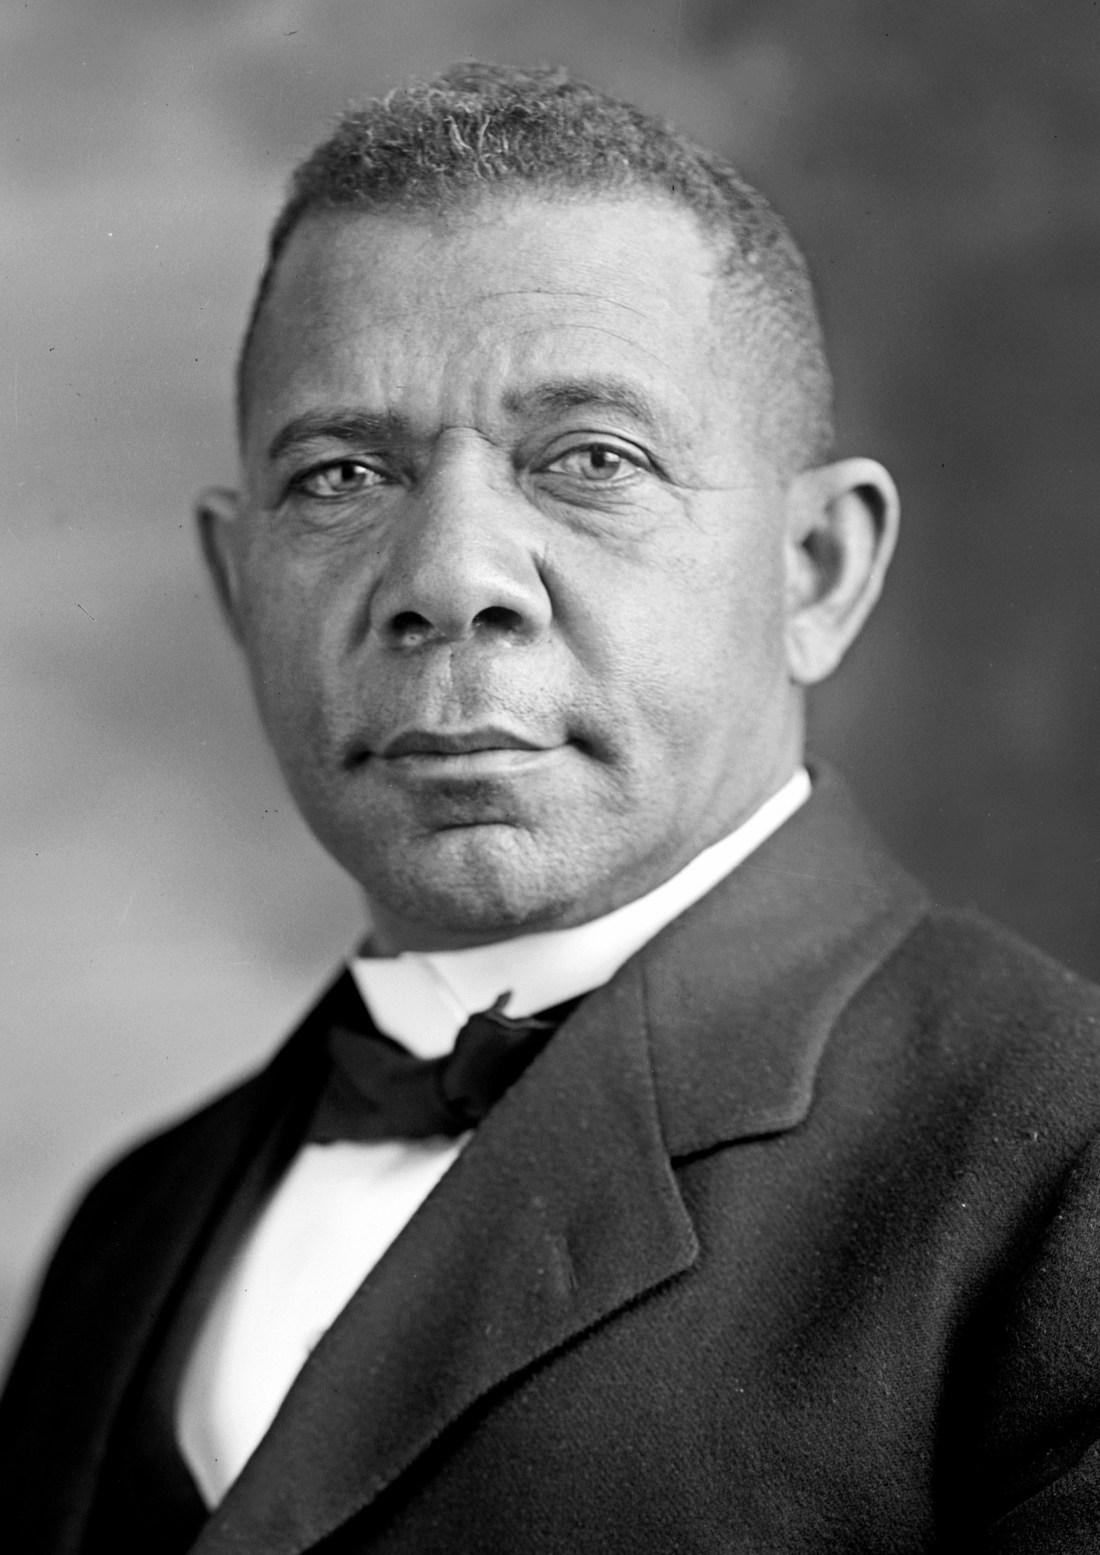 Tuskegee University, African American News, African American Education, Black History, Black Education, Black Colleges, Historically Black College and University, HBCU, KOLUMN Magazine, KOLUMN